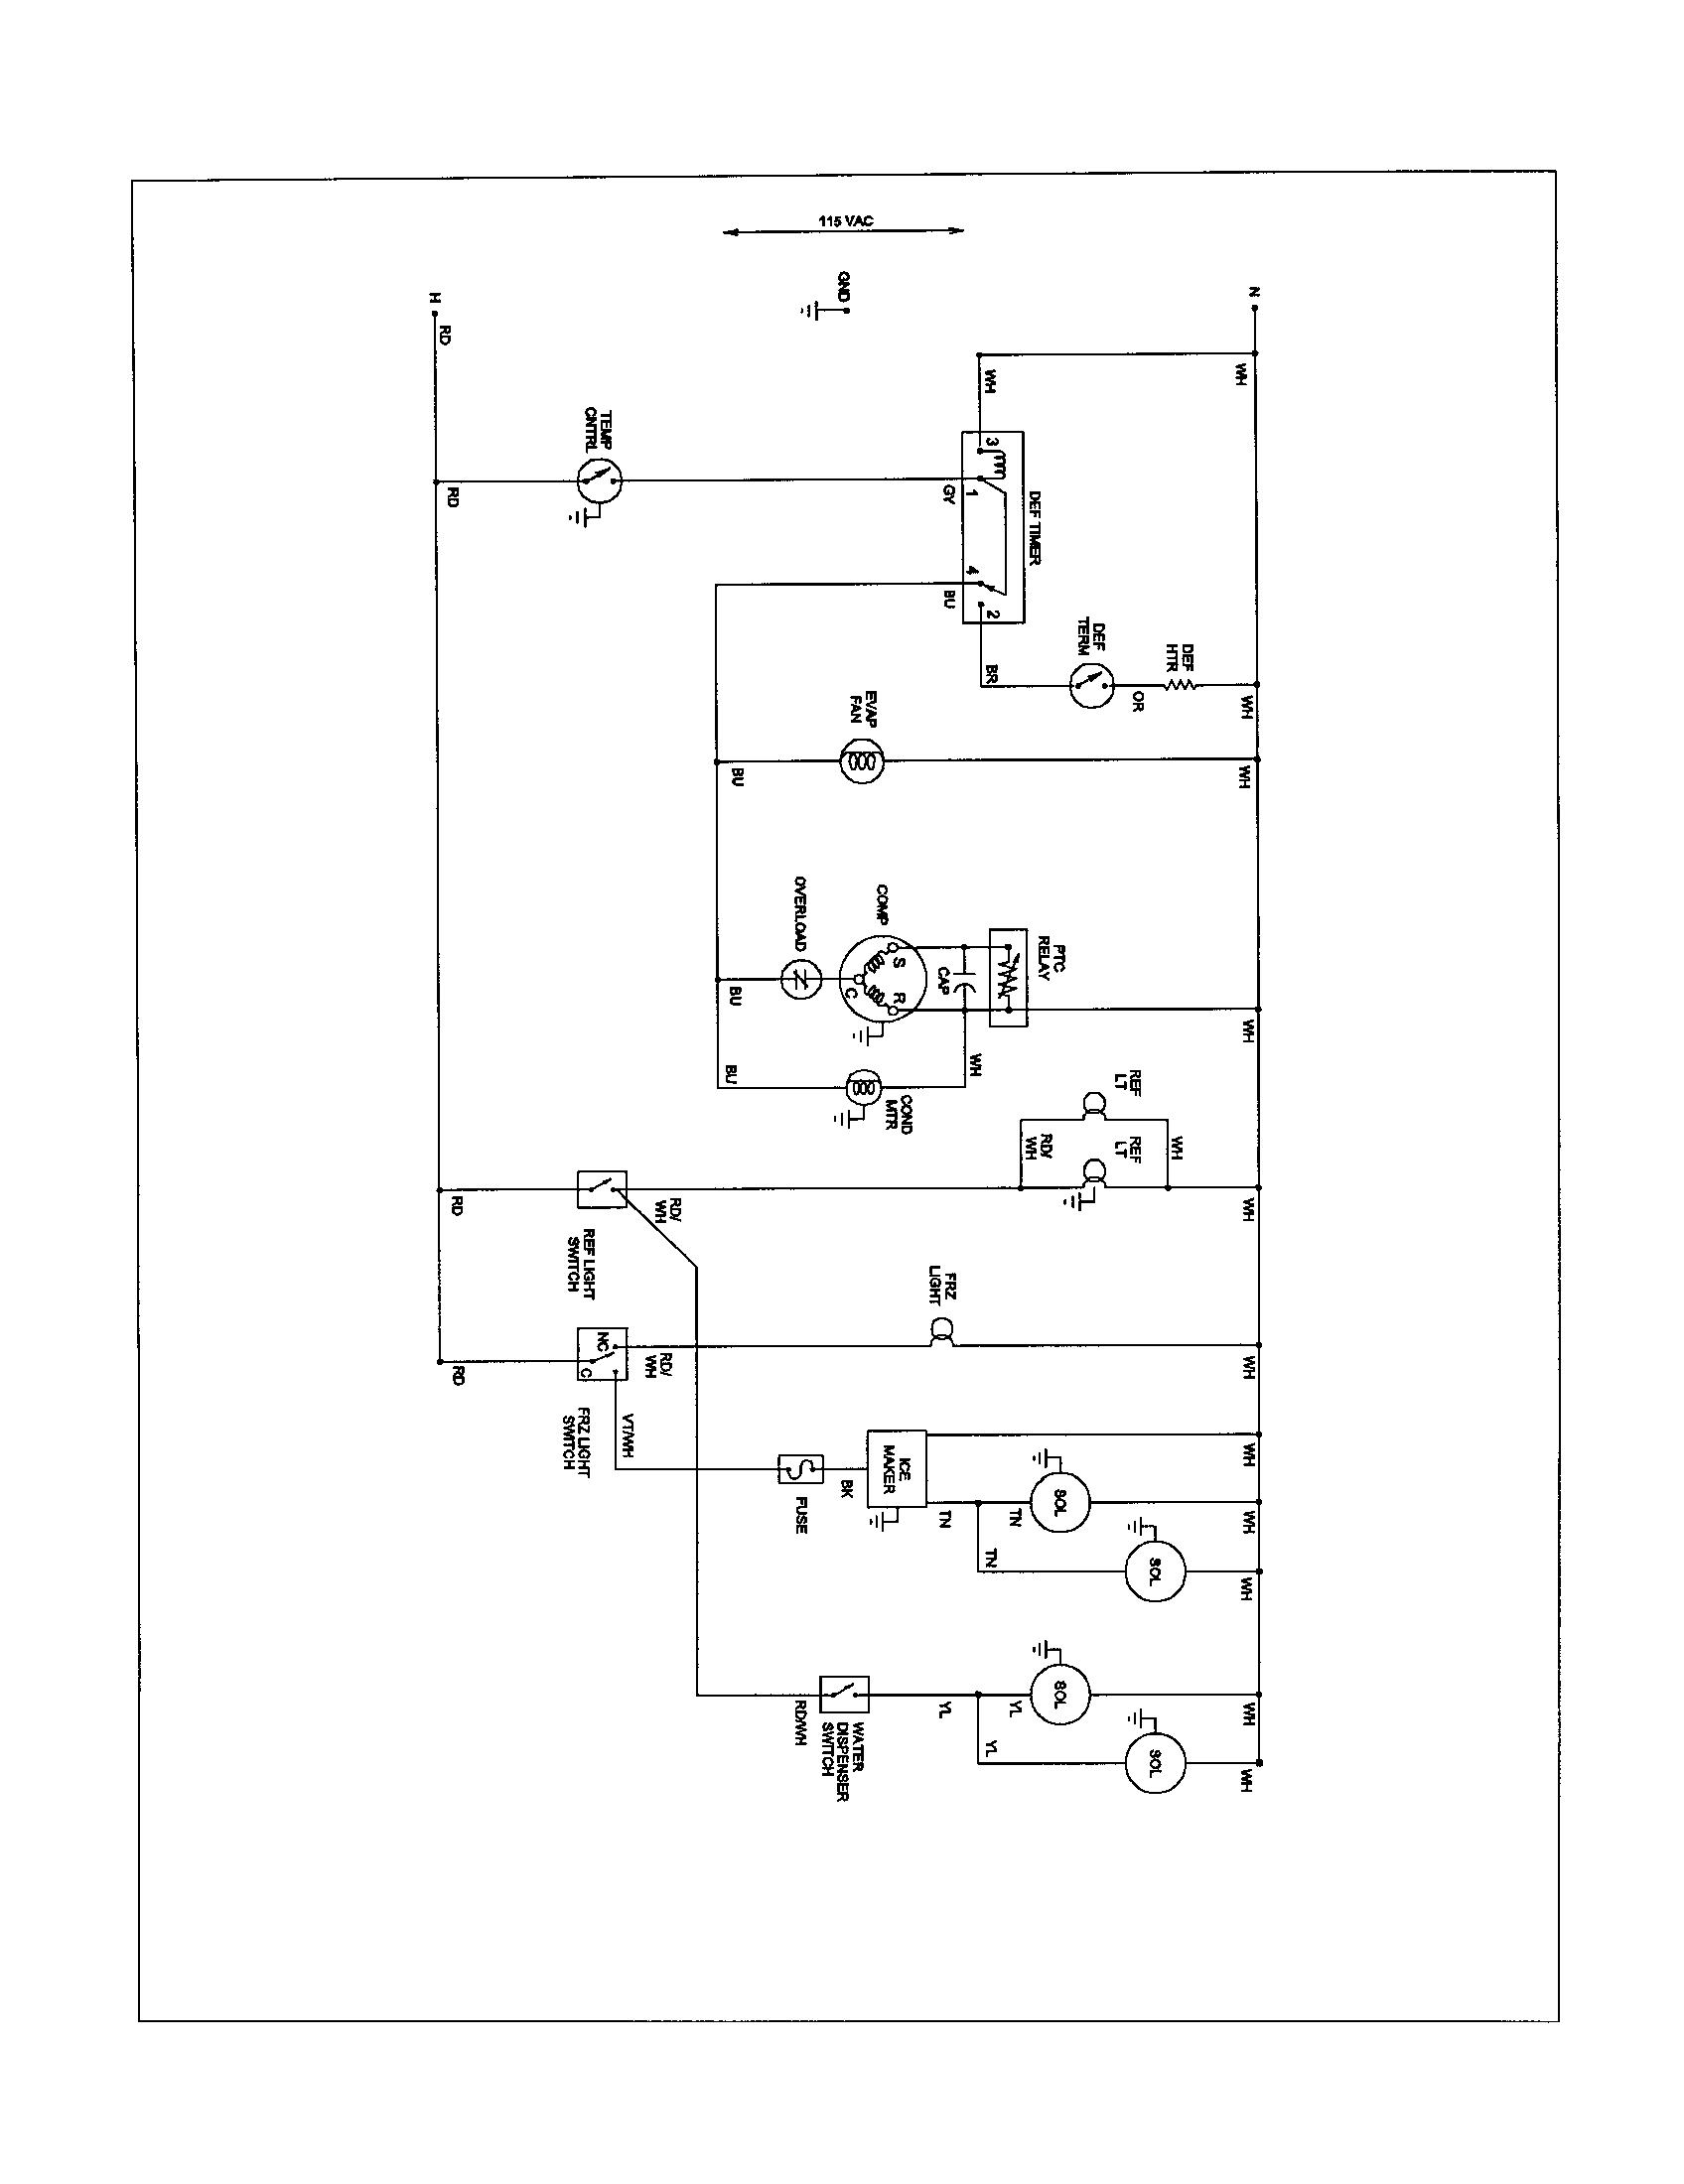 ND_8397] True Mercial Refrigerator Repair On T 49F True Freezer Wiring  Diagram Download DiagramReda Anth Vira Unnu Ommit Egre Wigeg Mohammedshrine Librar Wiring 101